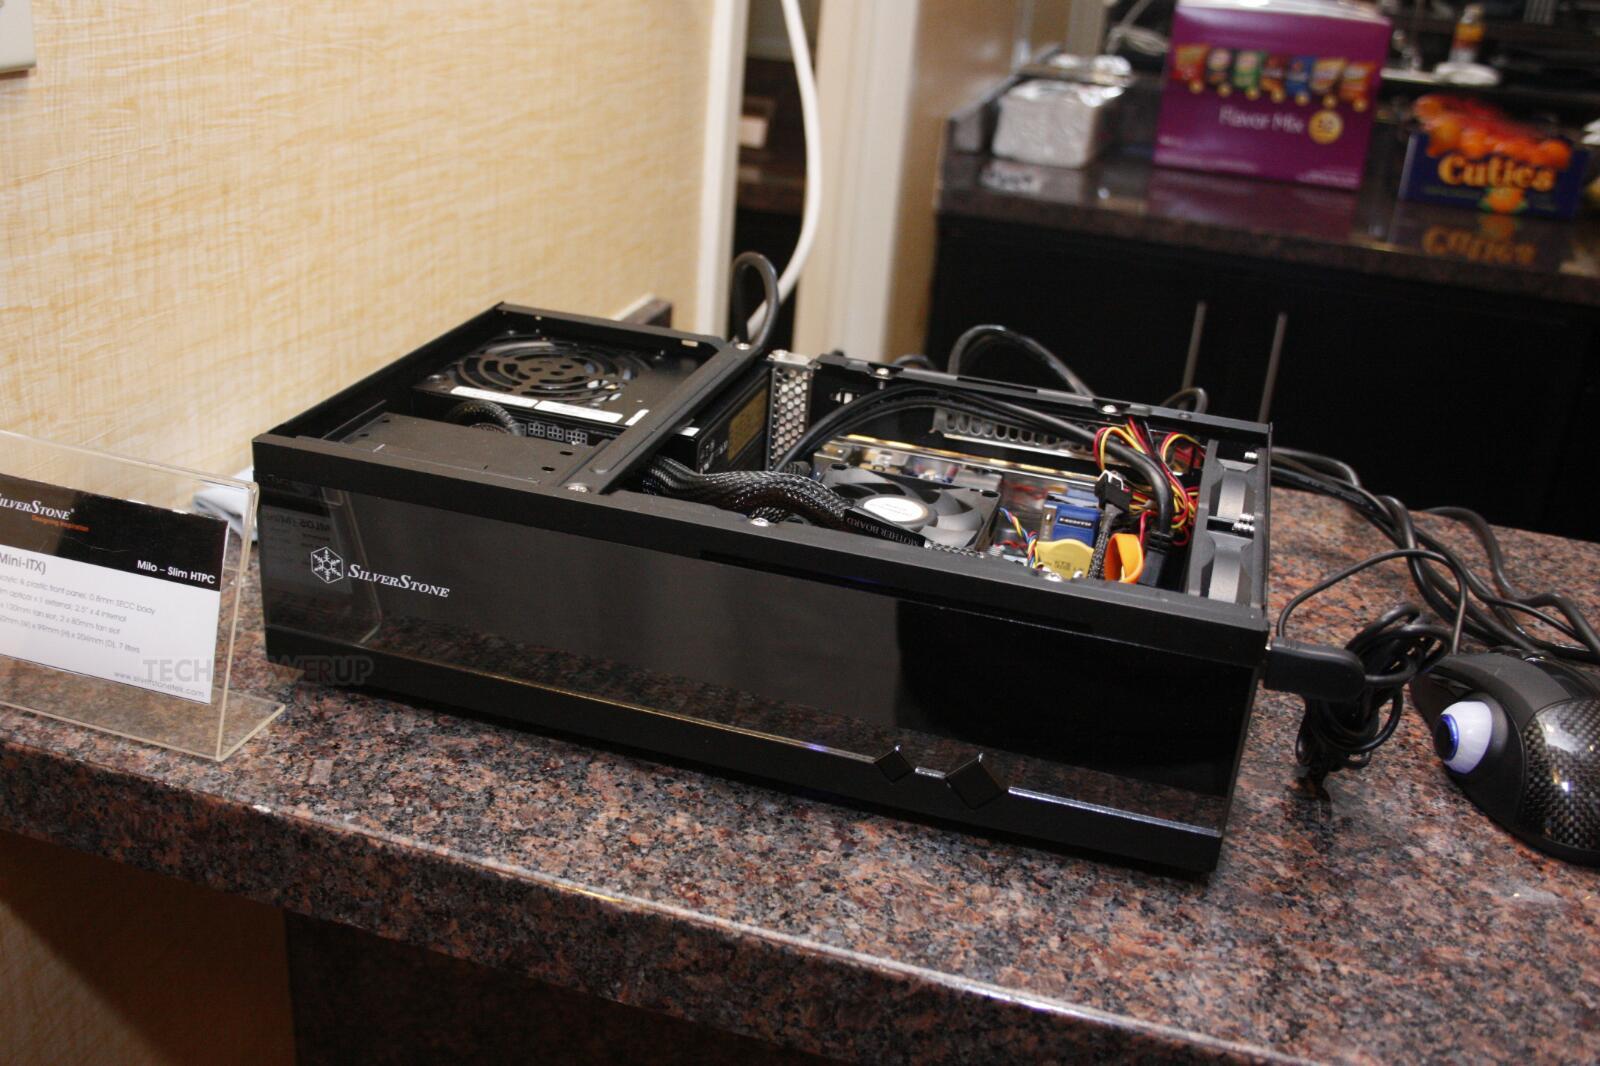 Silverstone Milo Ml05 Htpc Case Unveiled Techpowerup